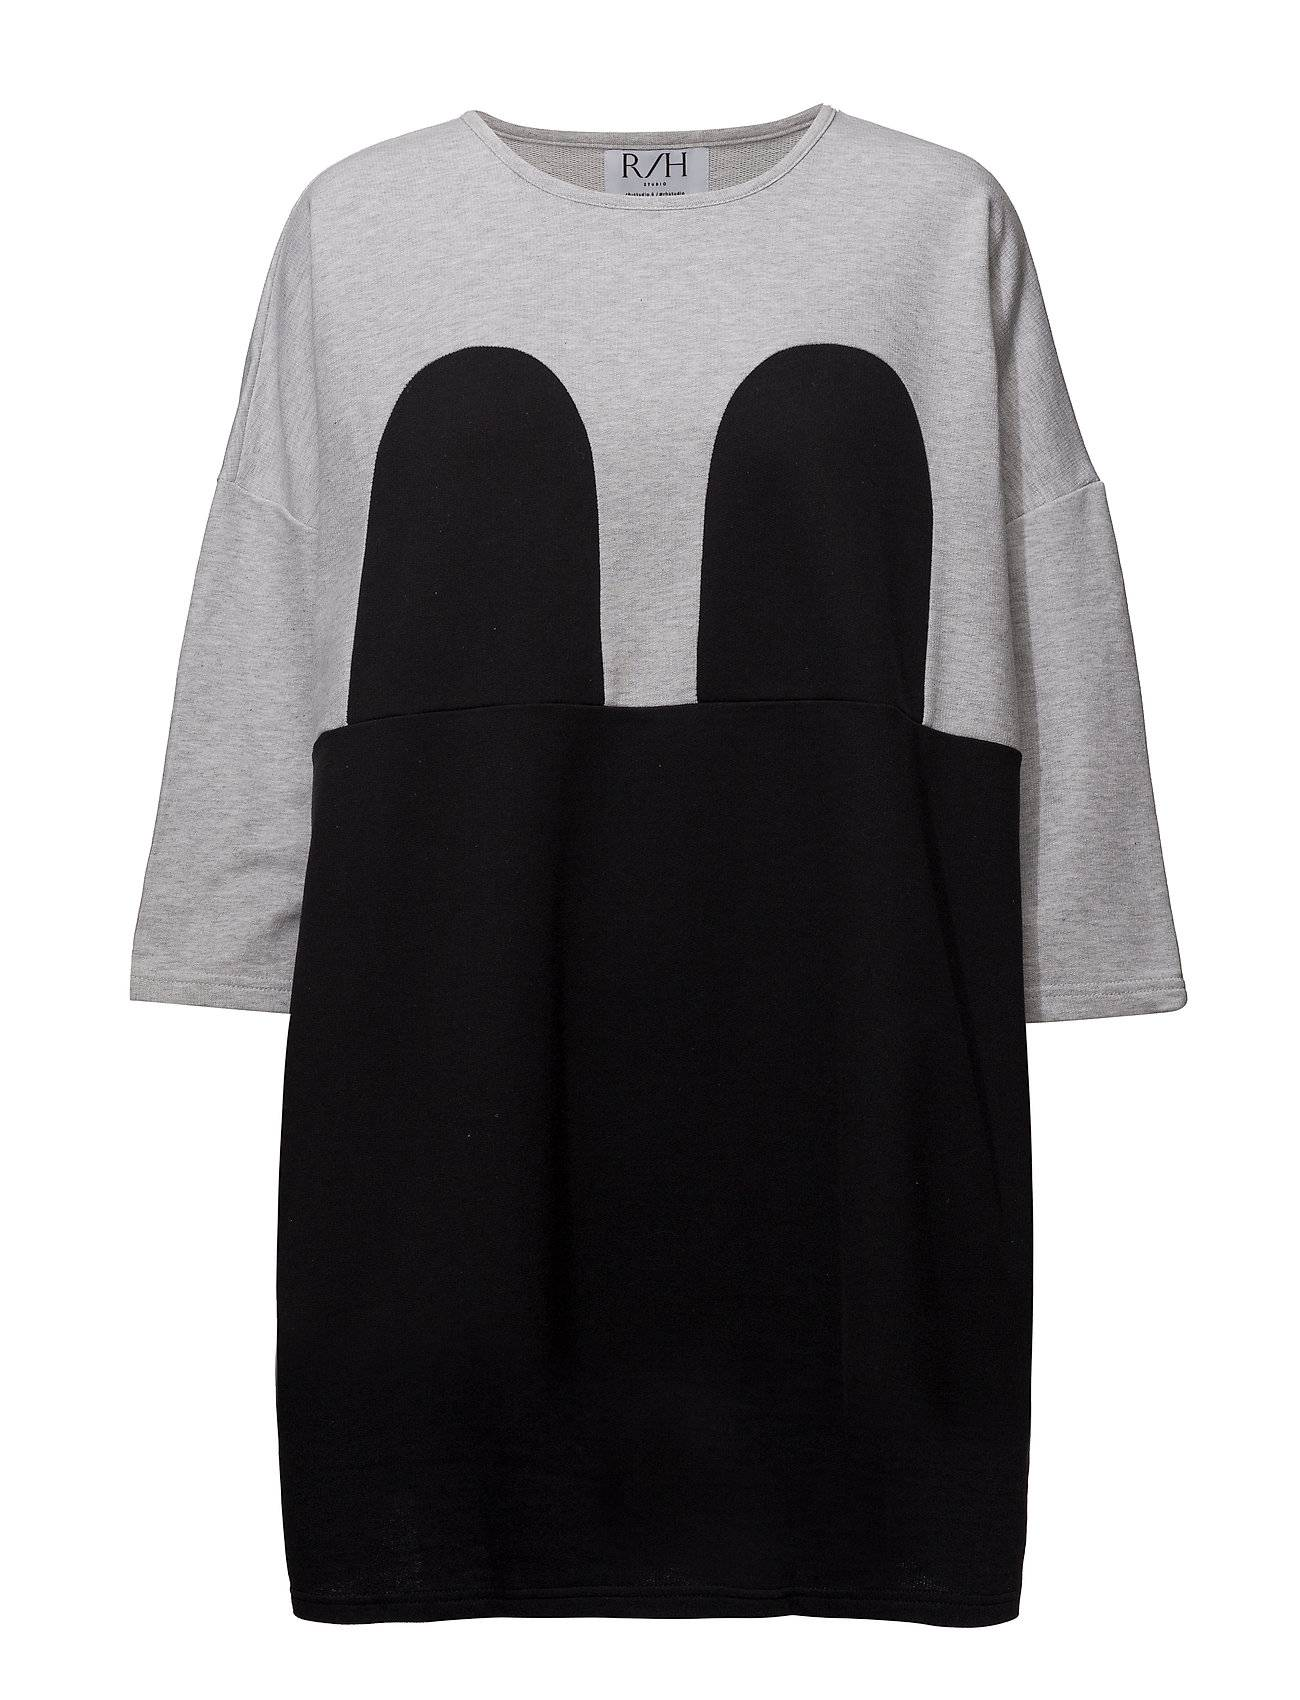 R/H Studio Mickey Square Dress Lyhyt Mekko Harmaa R/H Studio